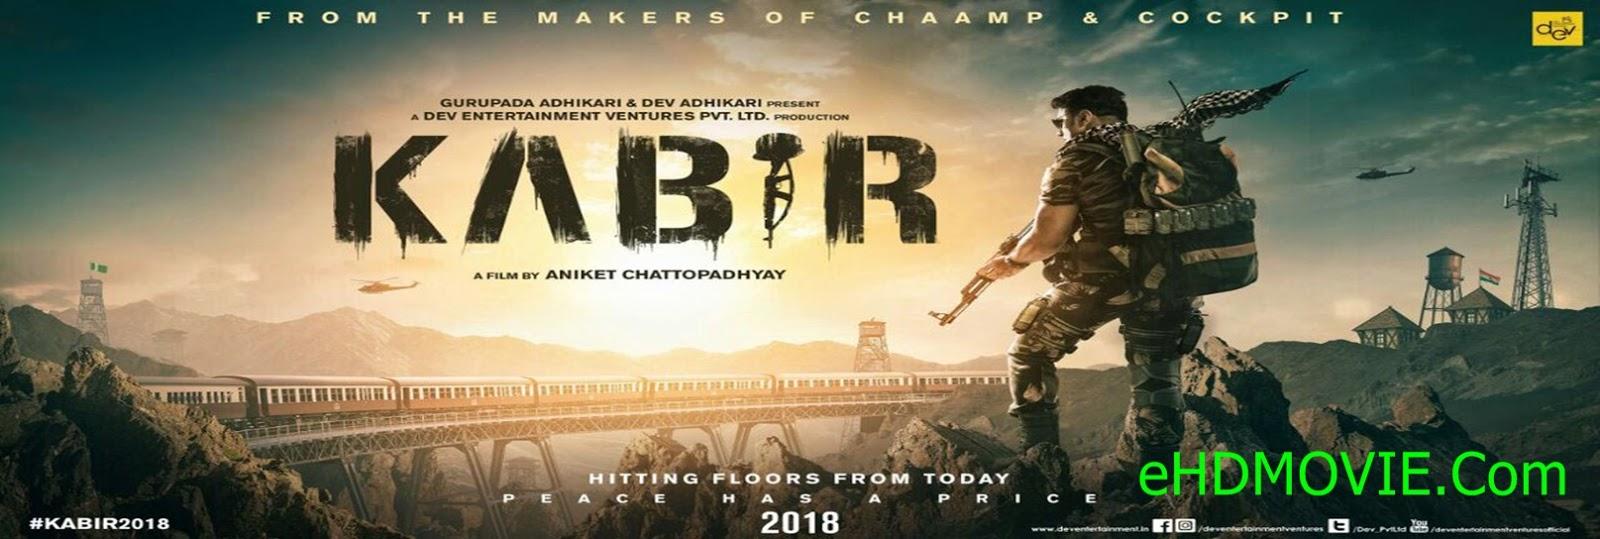 Kabir 2018 Bengali Full Movie Original 480p - 720p ORG WEB-DL 400MB - 1GB